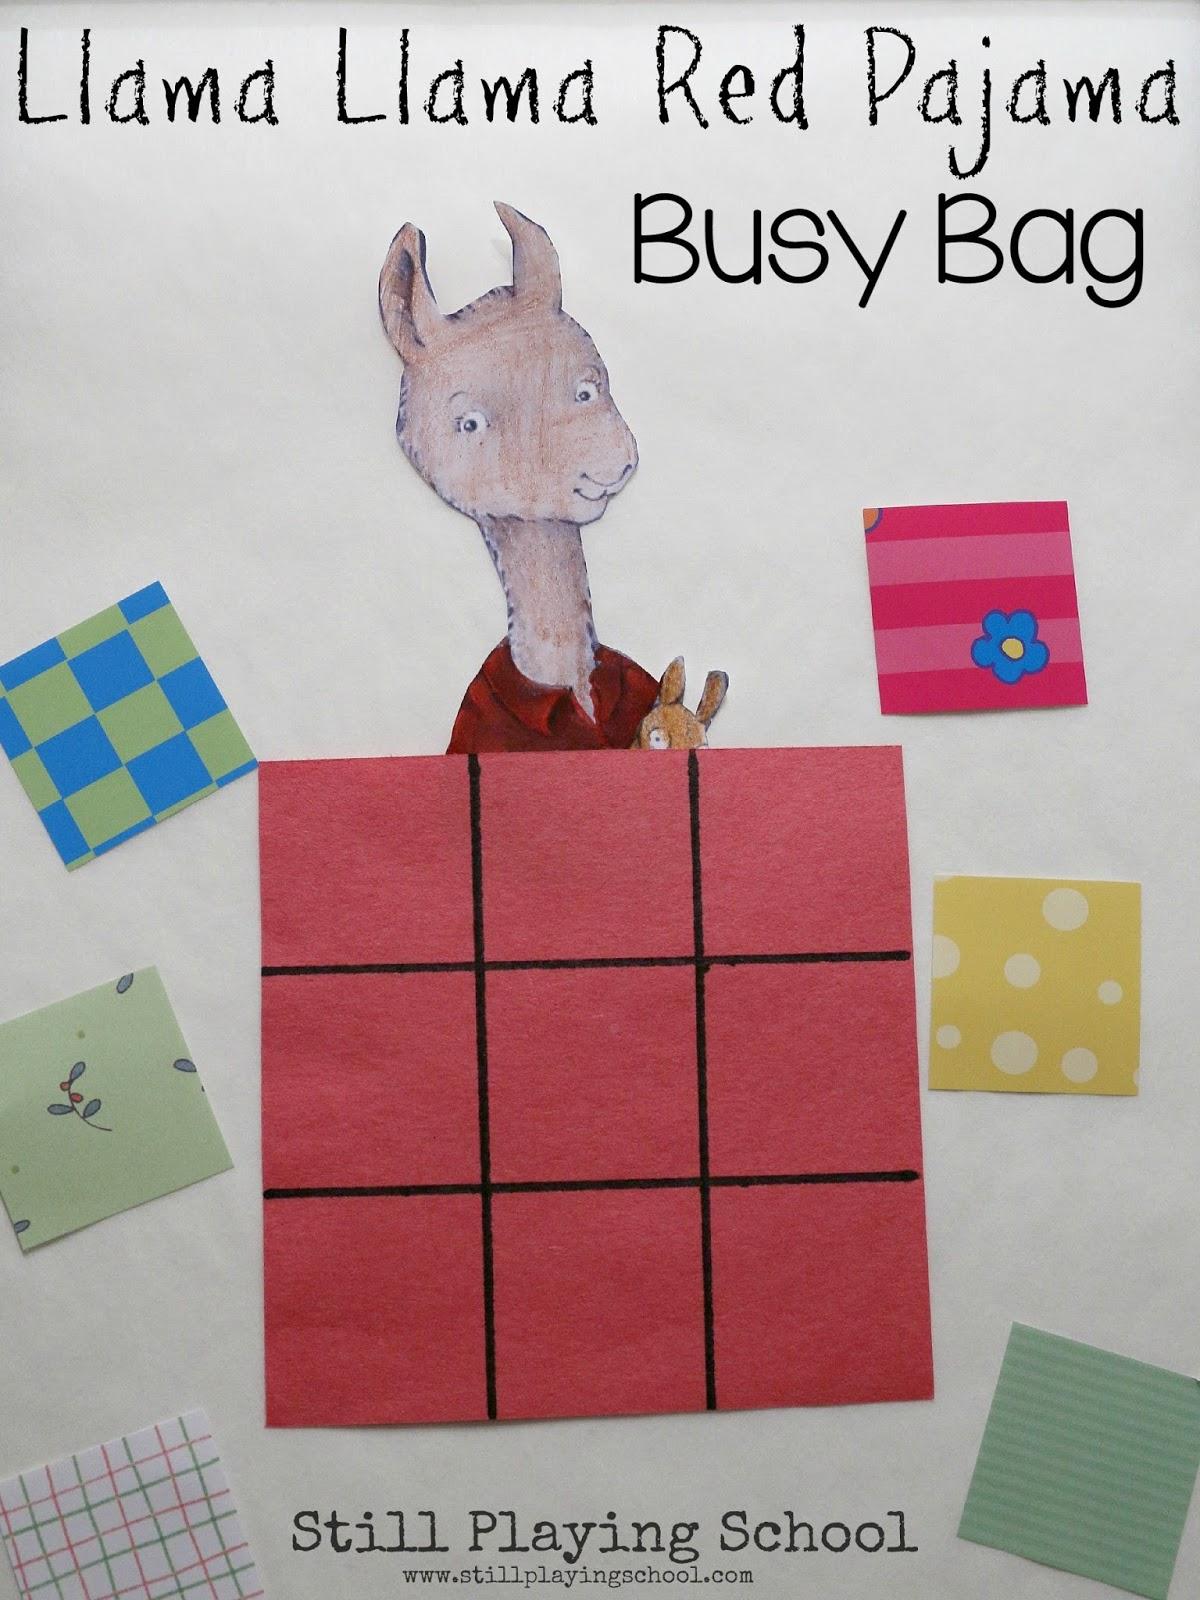 Llama Llama Red Pajama Busy Bag